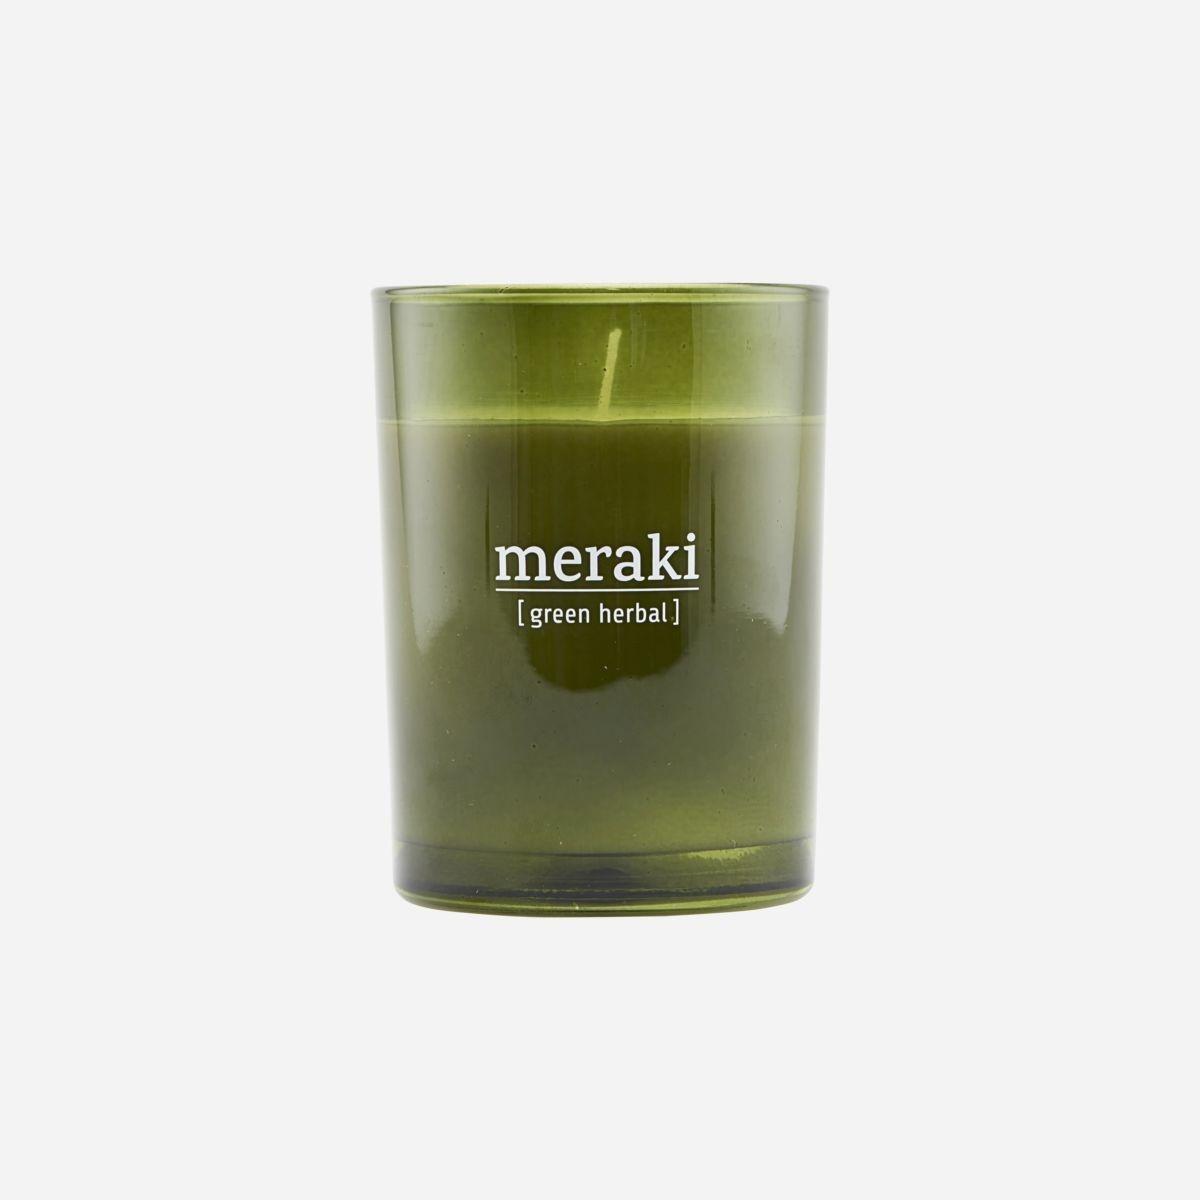 Meraki Meraki scented candle green herbal 8 x 10,5 cm